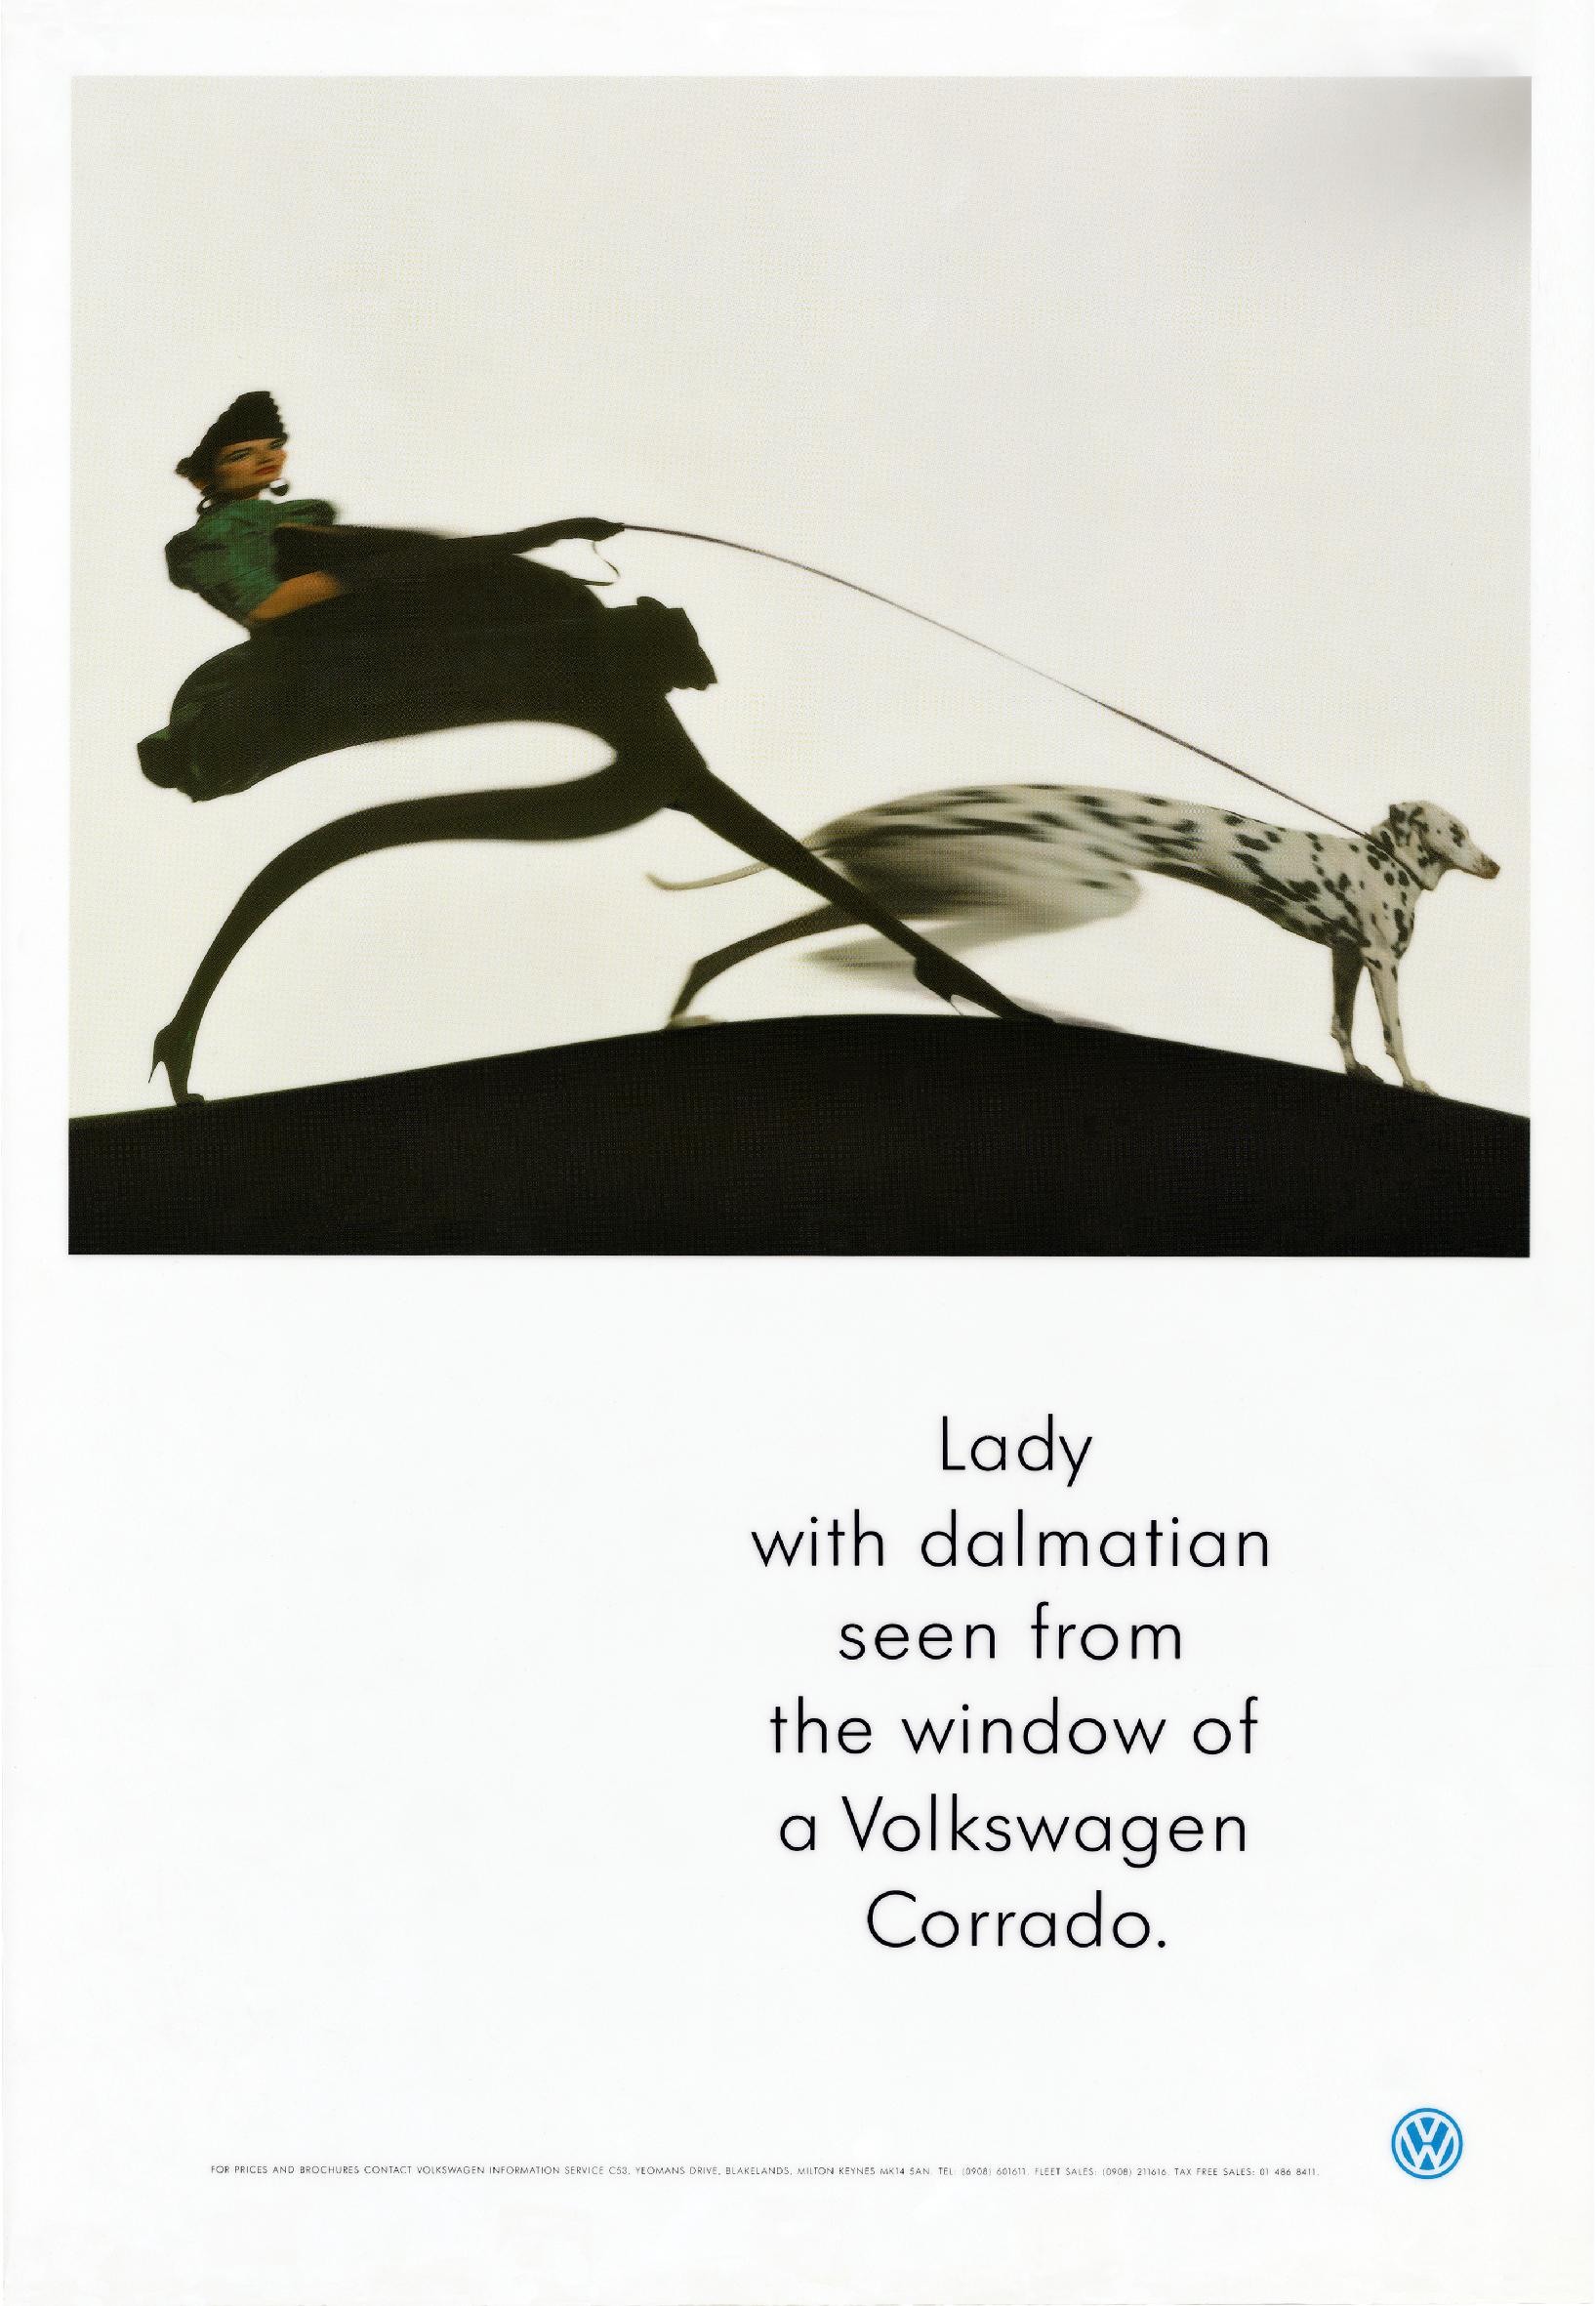 'Dalmation' Volkswagen, Mark Reddy, BMP-01.jpg